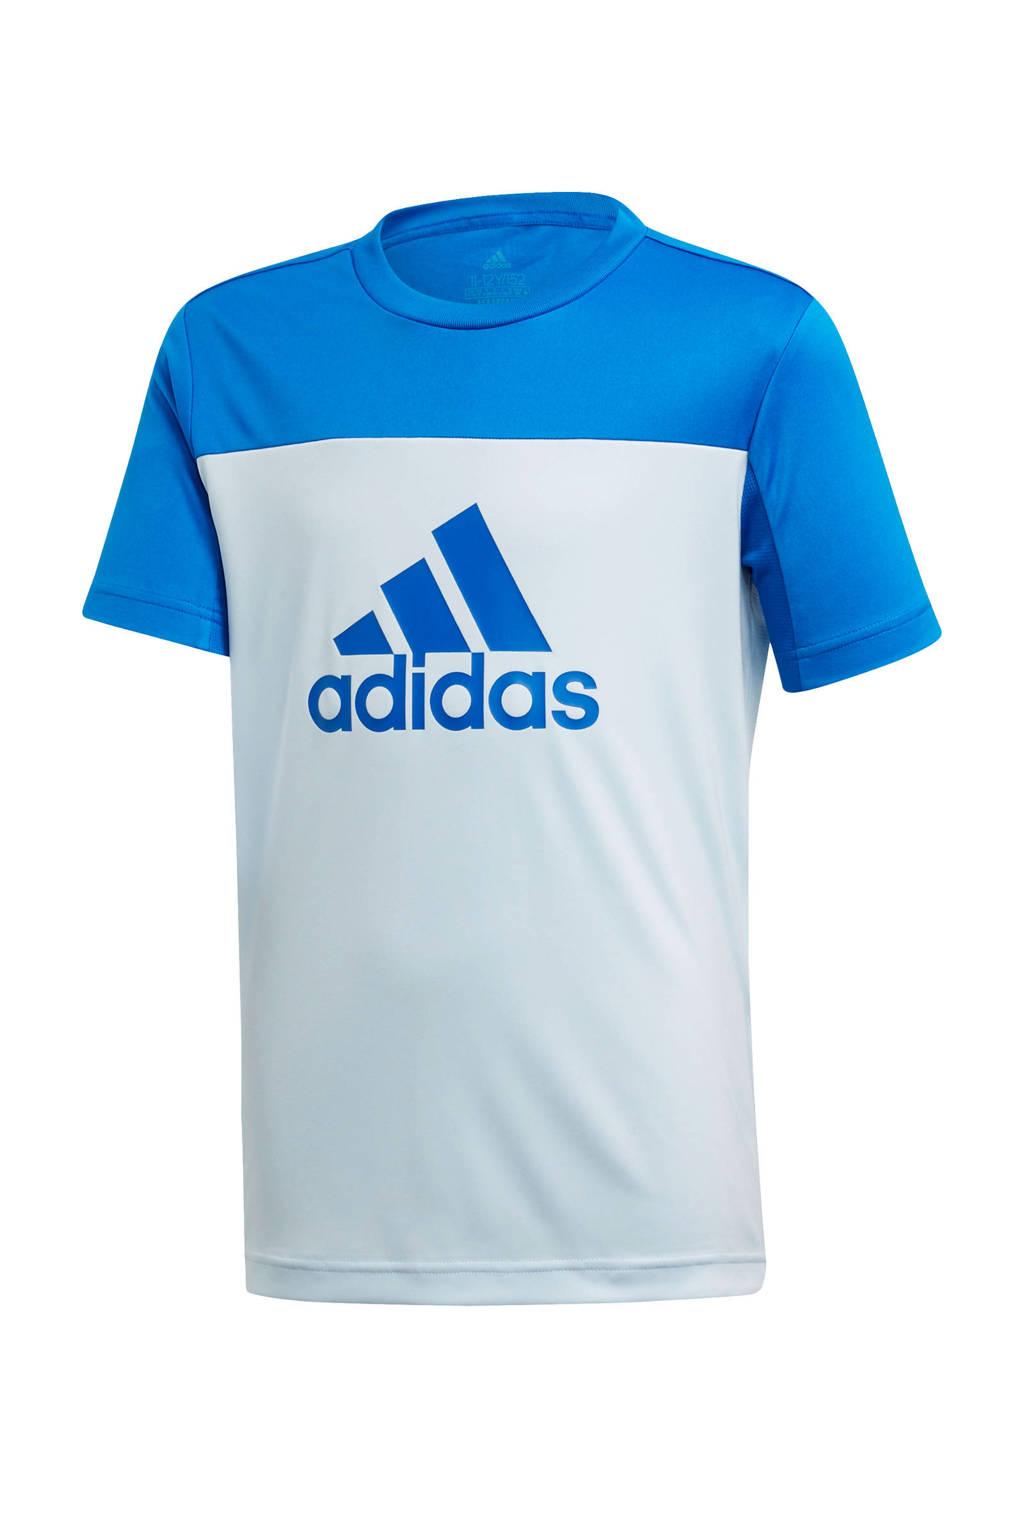 adidas Performance   sport T-shirt wit/blauw, Wit/blauw